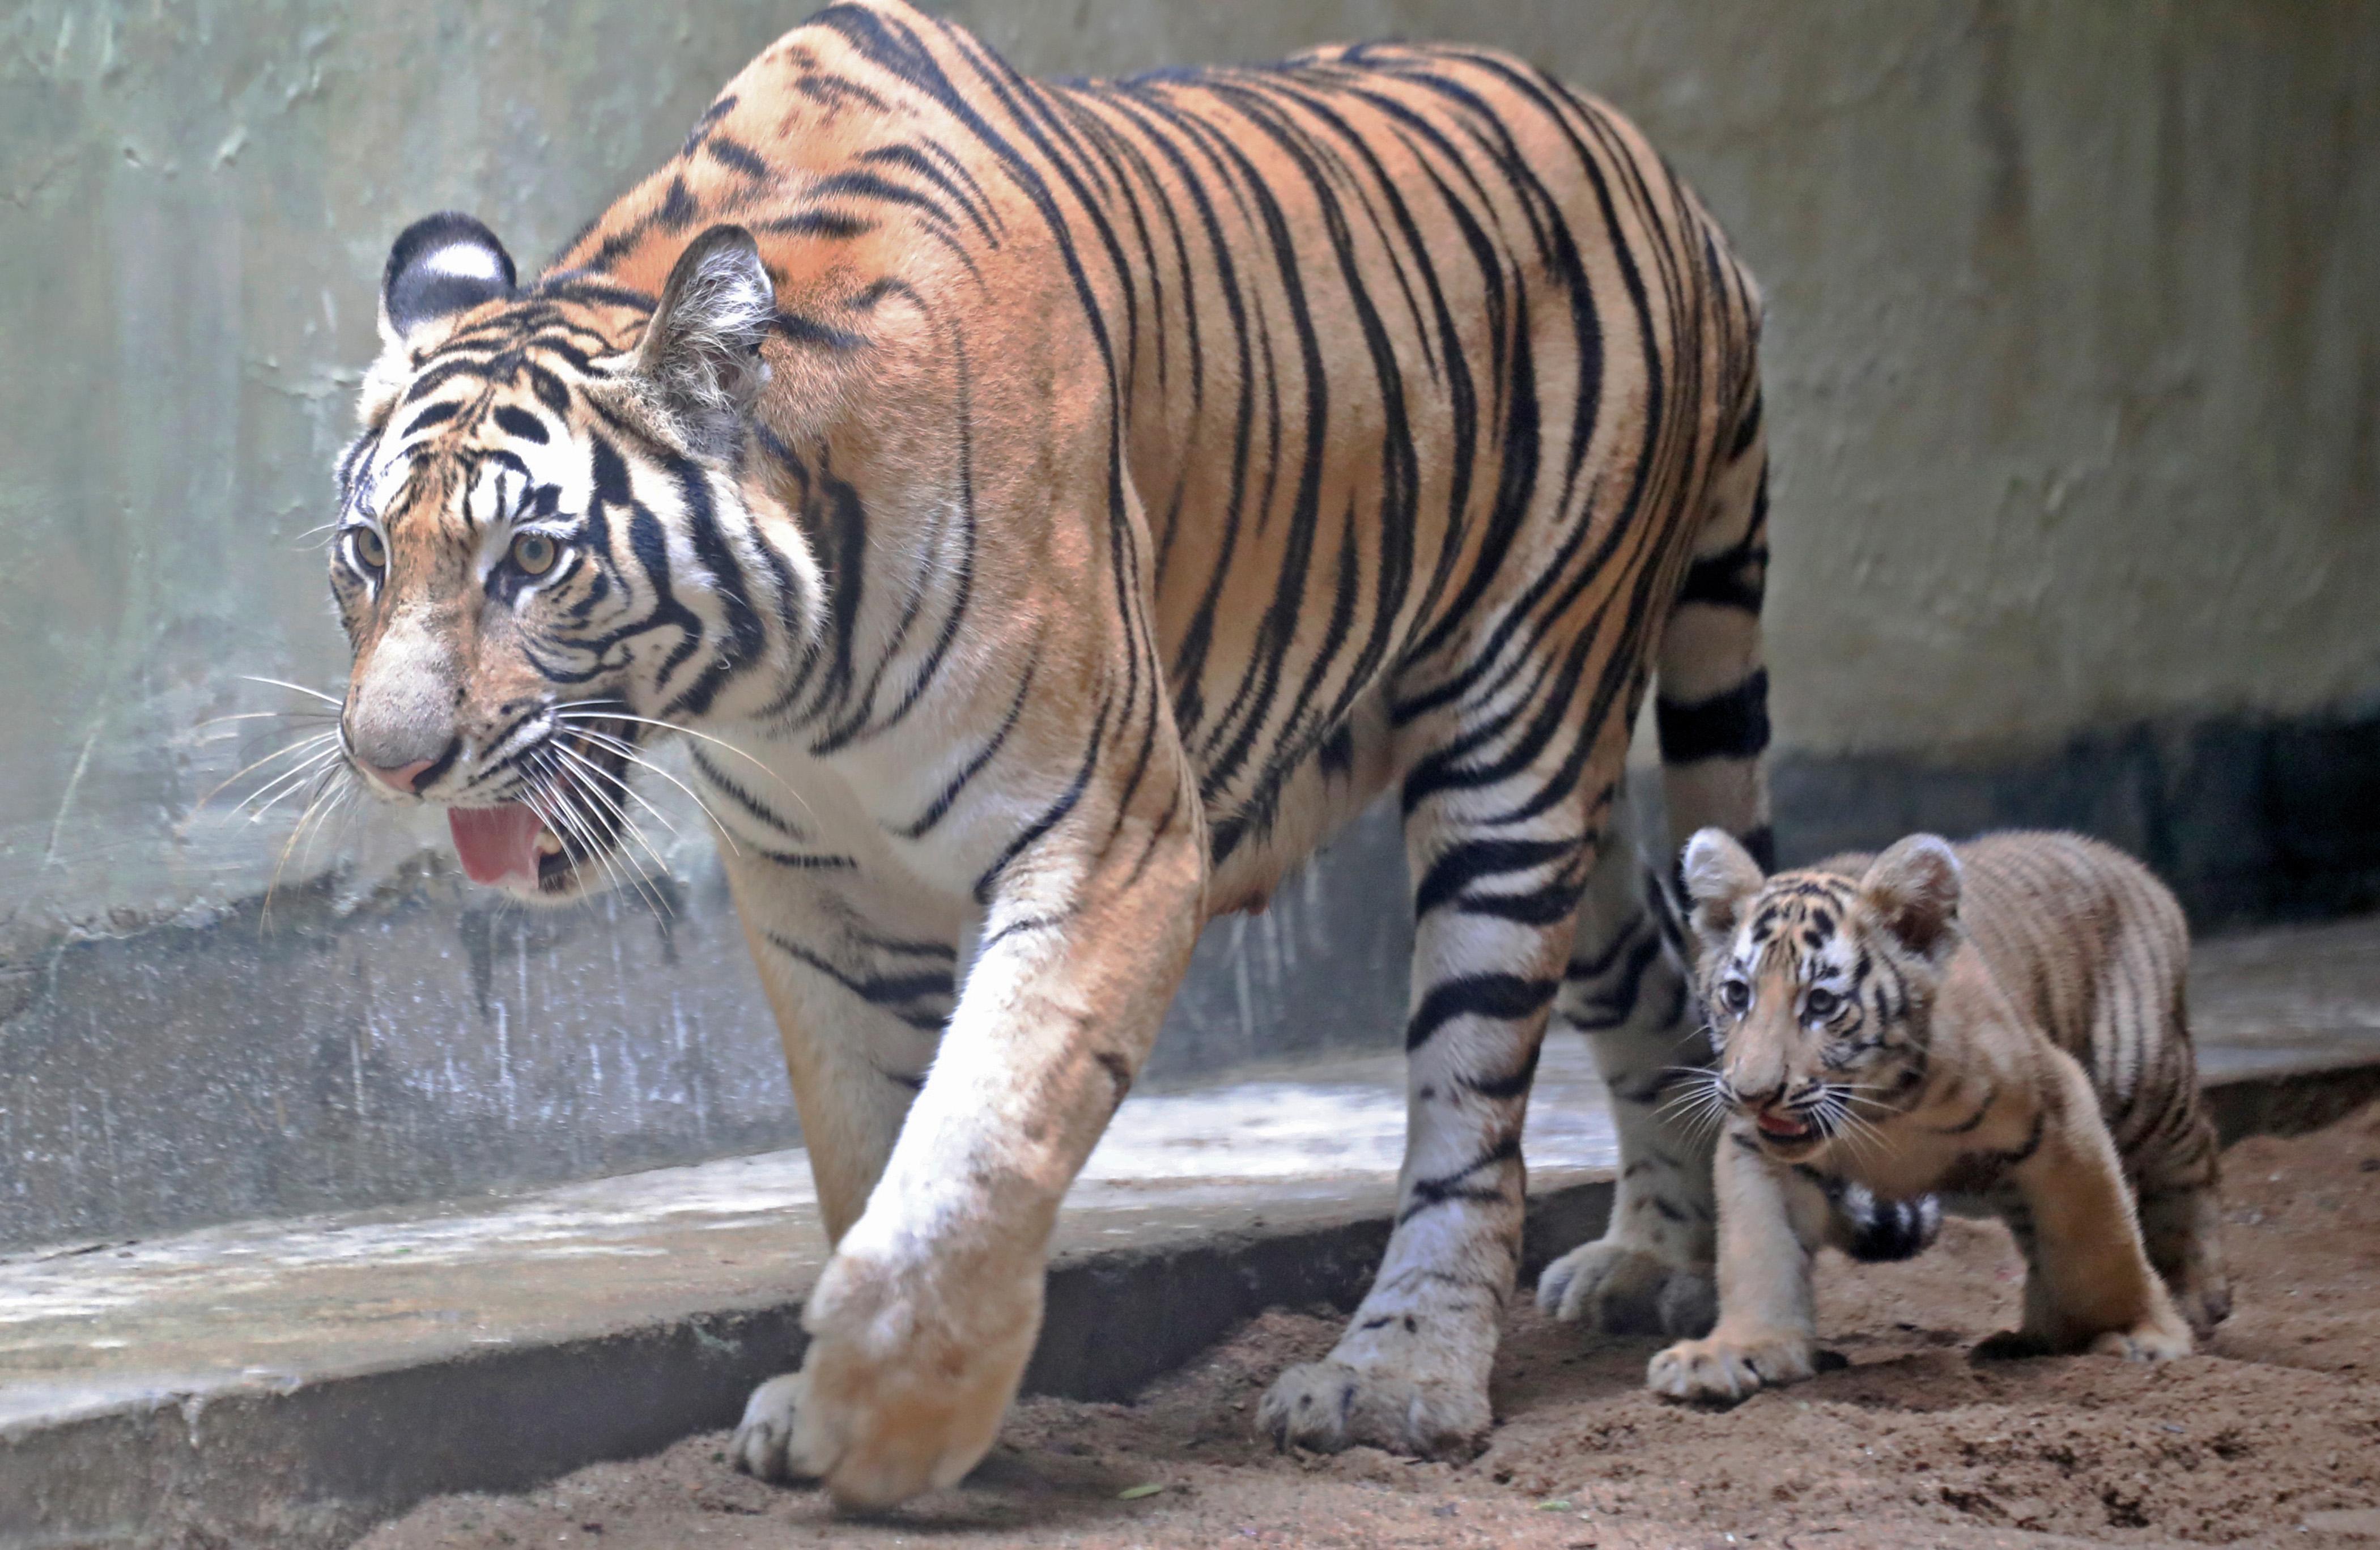 Newborn Bengal Tigers 'Durjoy And Avantika' At National Zoo